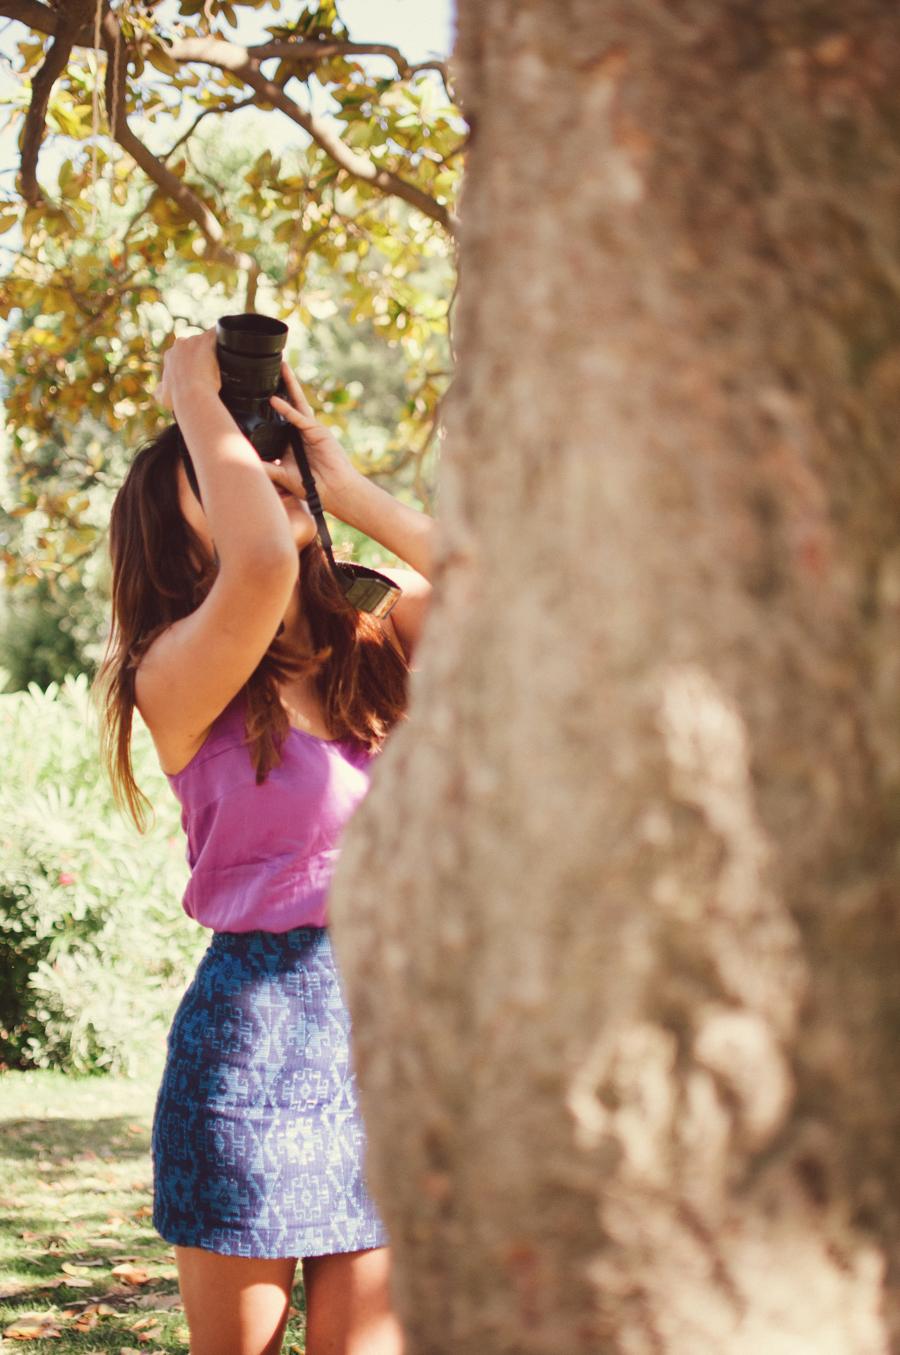 Hiromi Torres in Parc de la Ciutadella, Barcelona